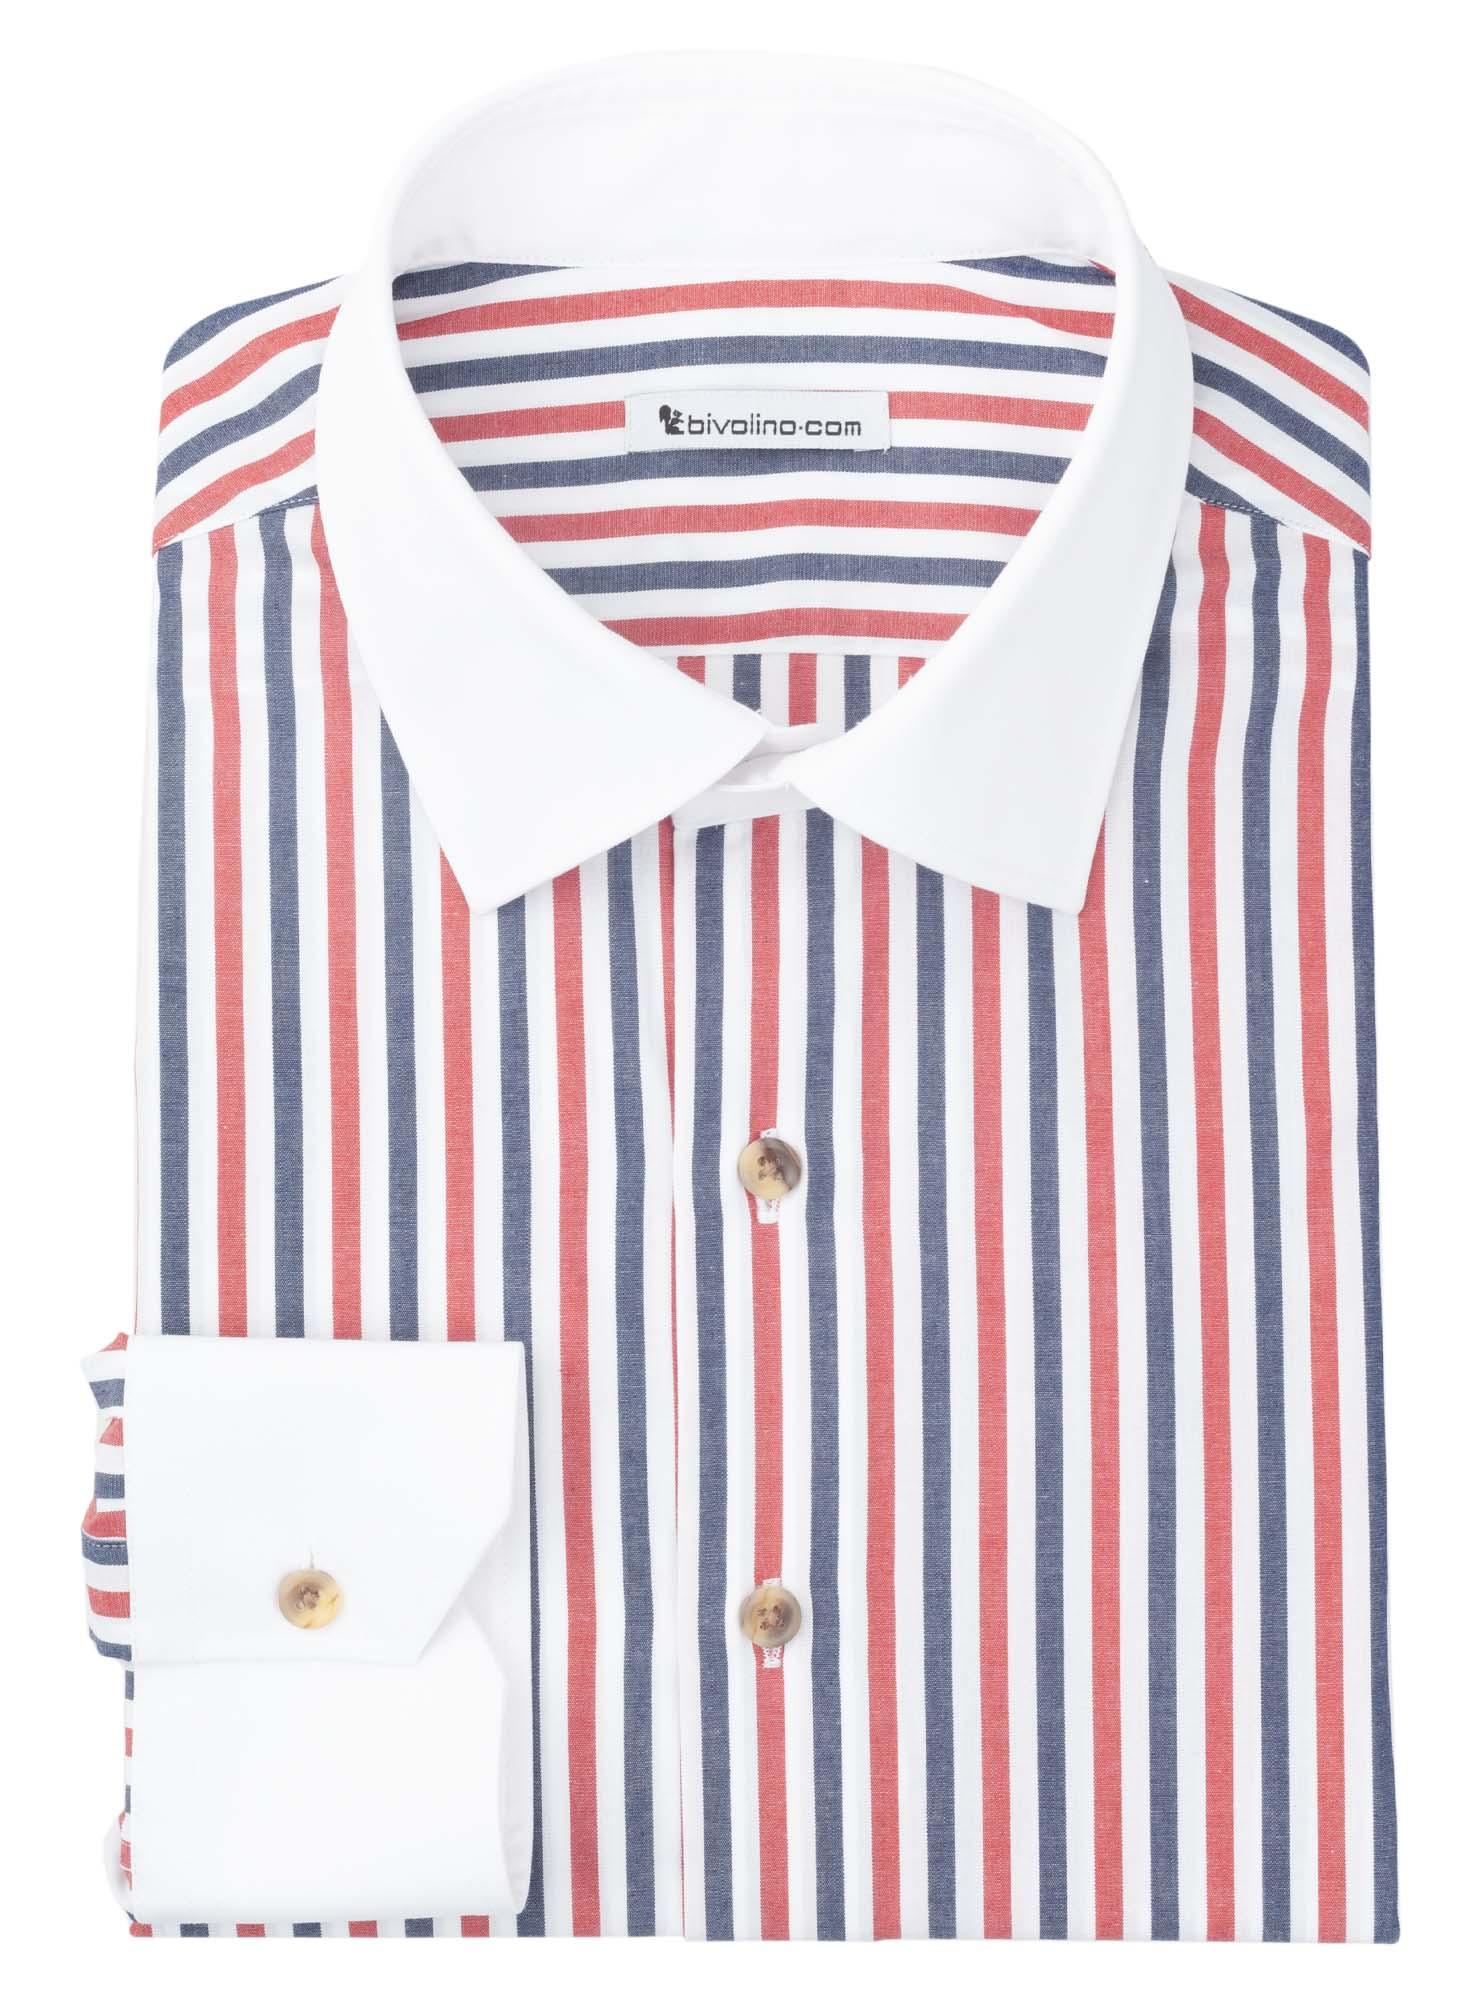 VALENCINA - tissu rayé  rouge -col blanc - winchester - Valencia 1